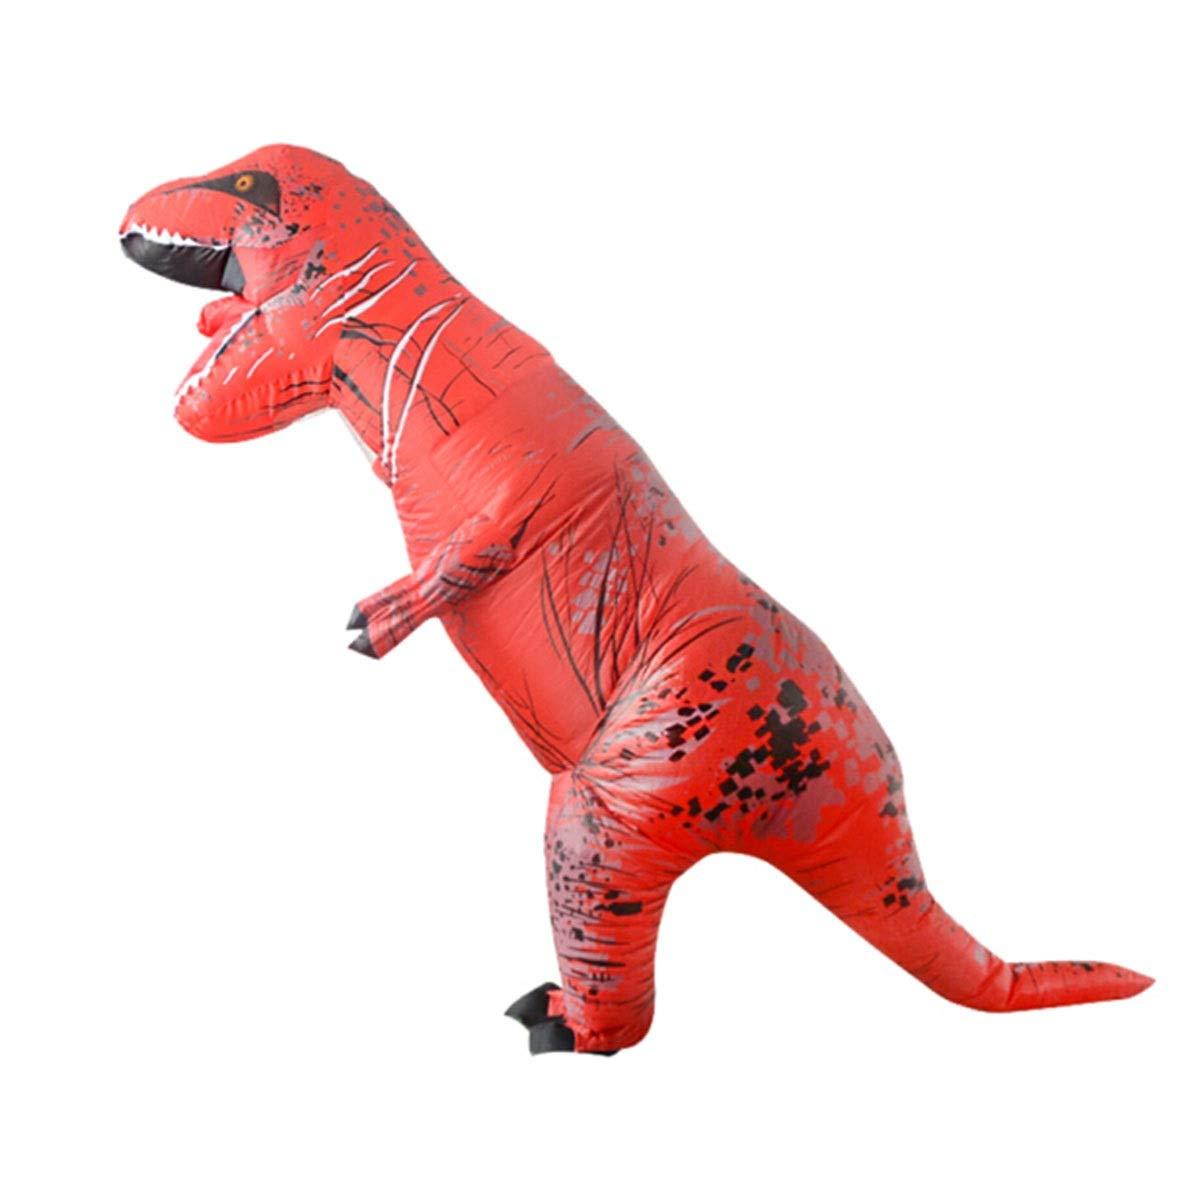 Dinosa inflable, Dinosaurios inflables, Traje de dinosaurio ...